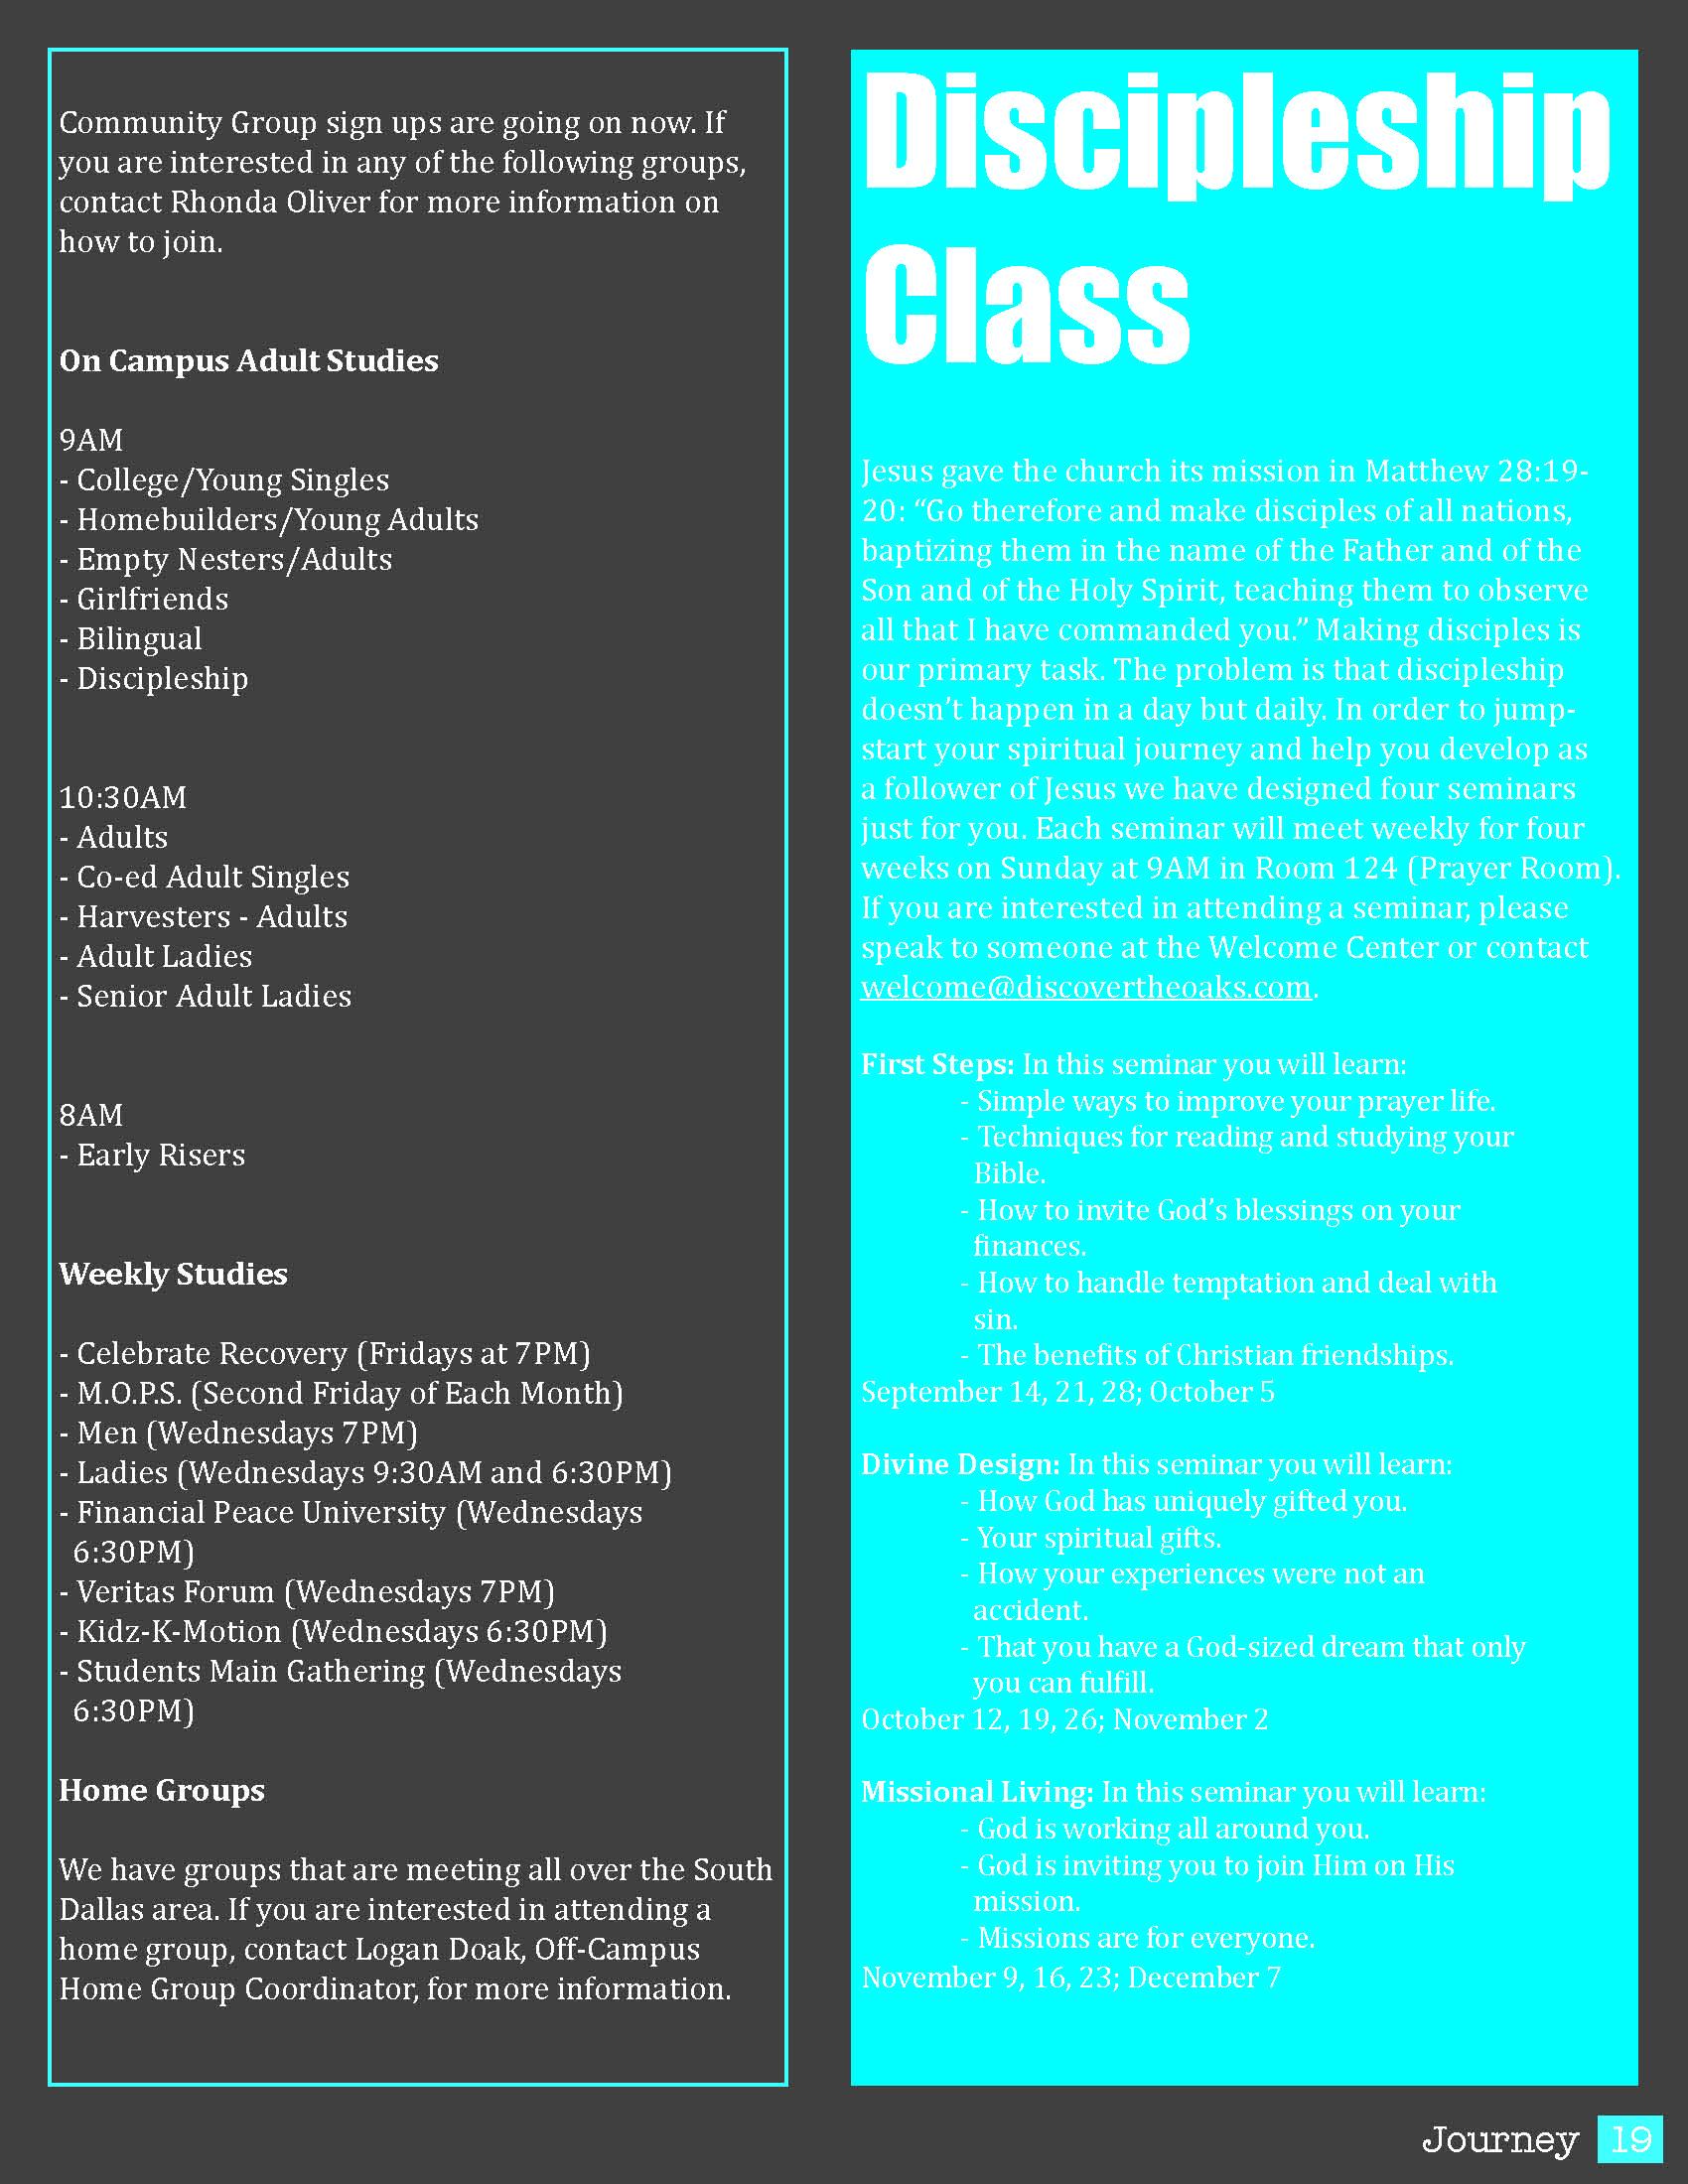 Journey September 2014_Page_19.jpg